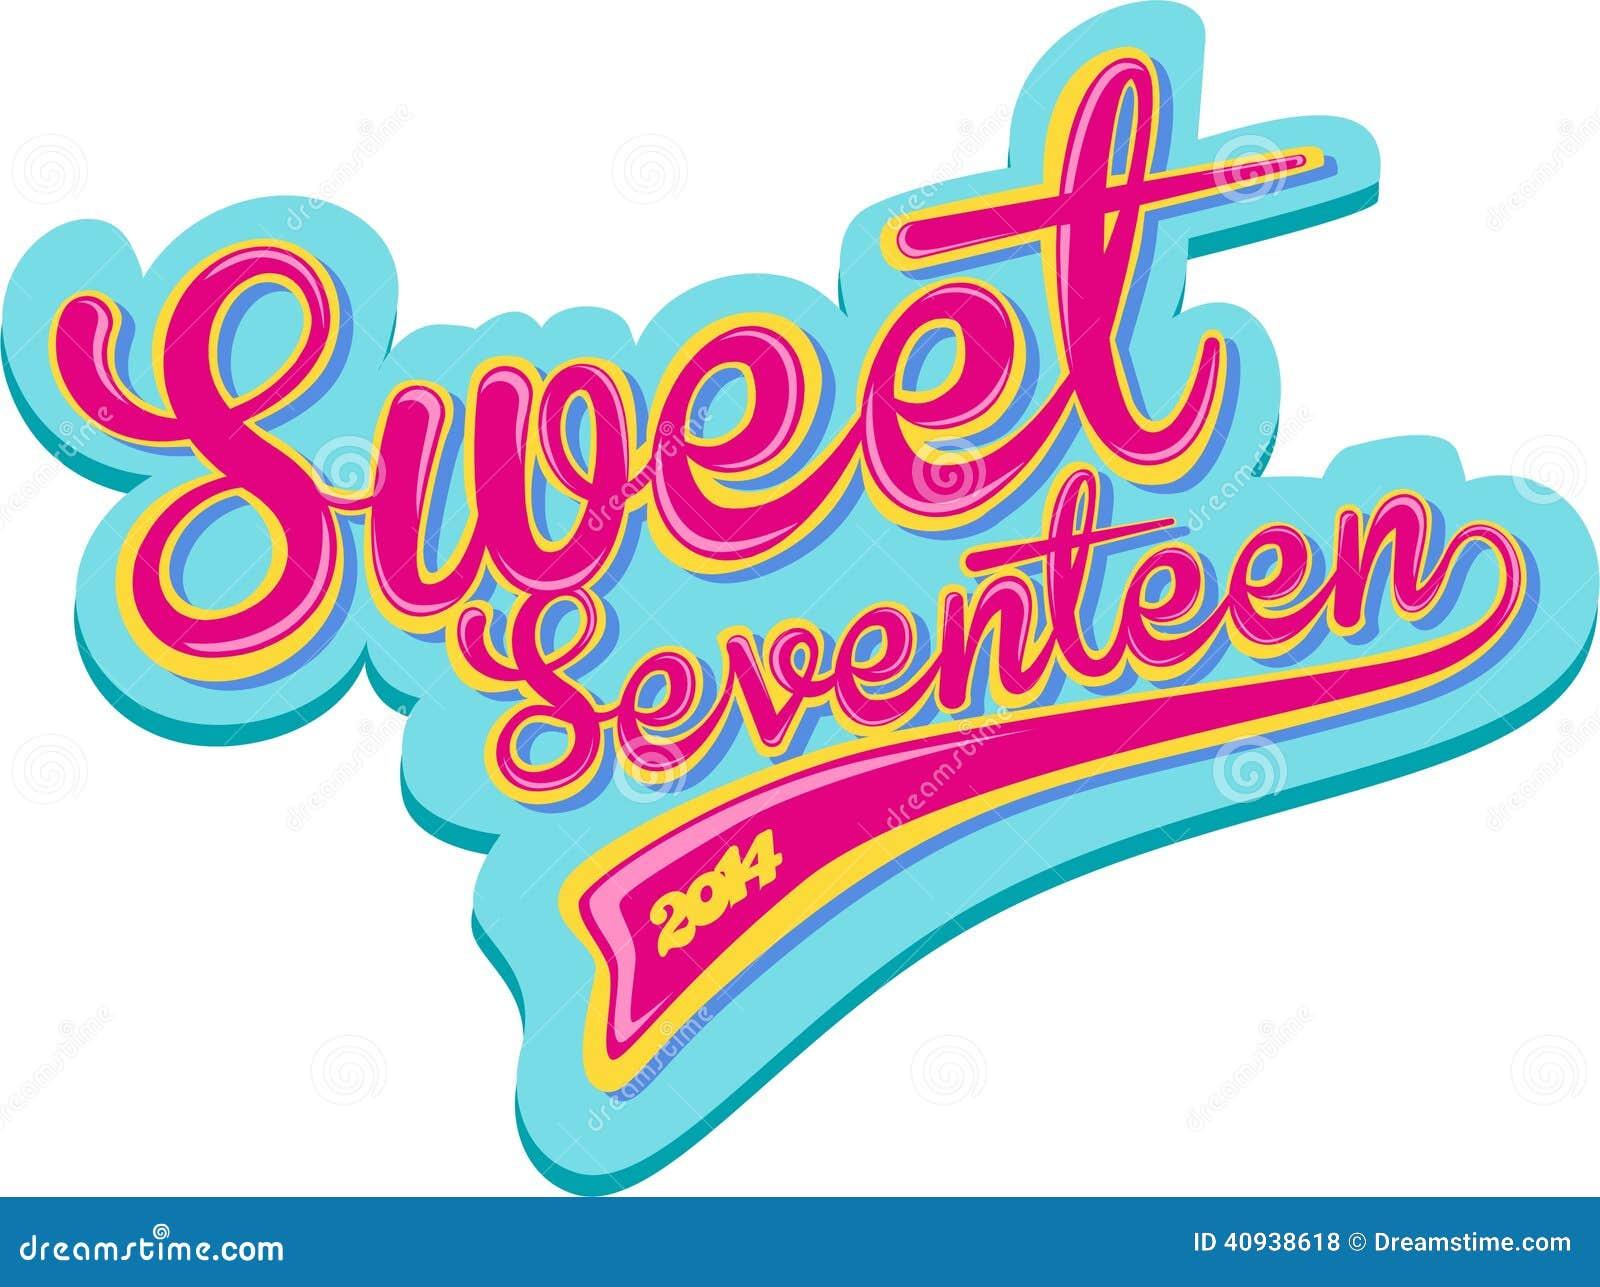 sweet seventeen retro design stock illustration illustration of retro stars 40938618 dreamstime com